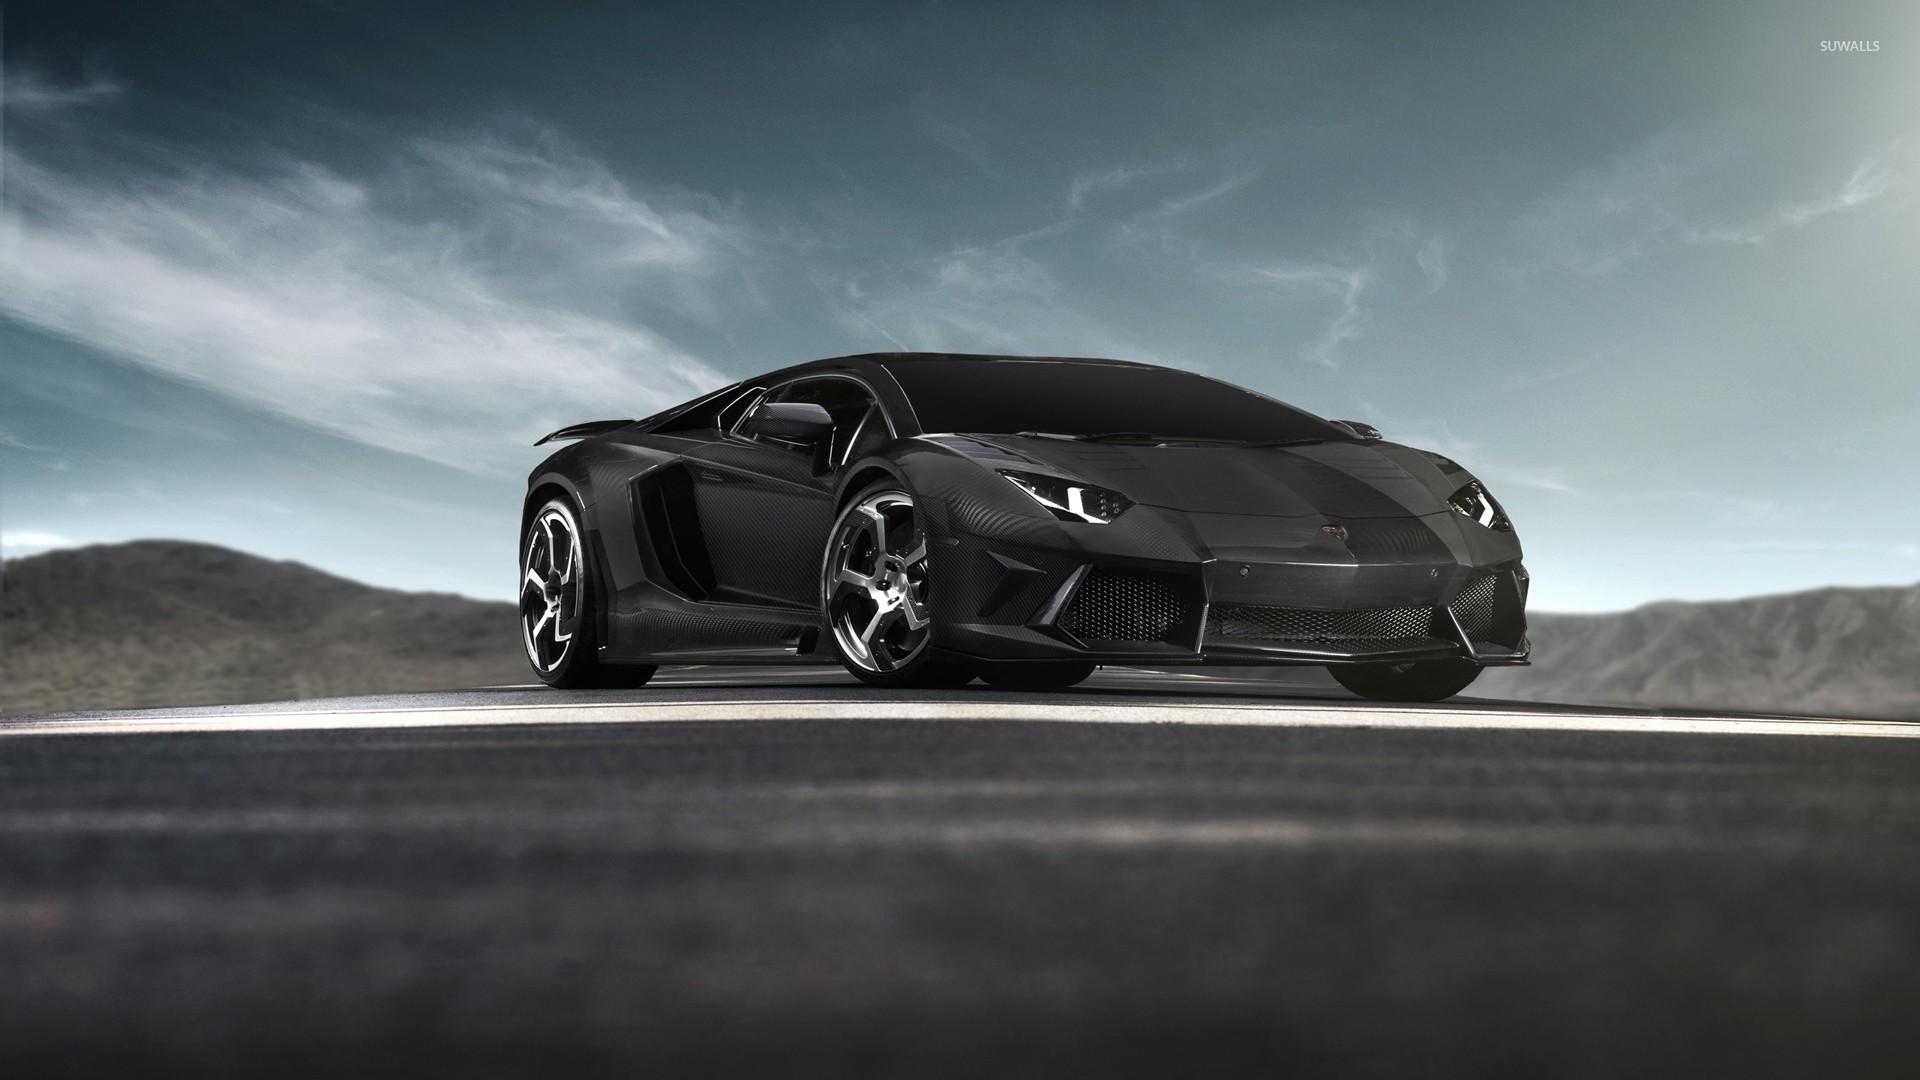 3840x2160 Novitec Torado Lamborghini Huracan RWD 4K. Download · 1920x1080 Cool Cars Lamborghini Wallpaper ...